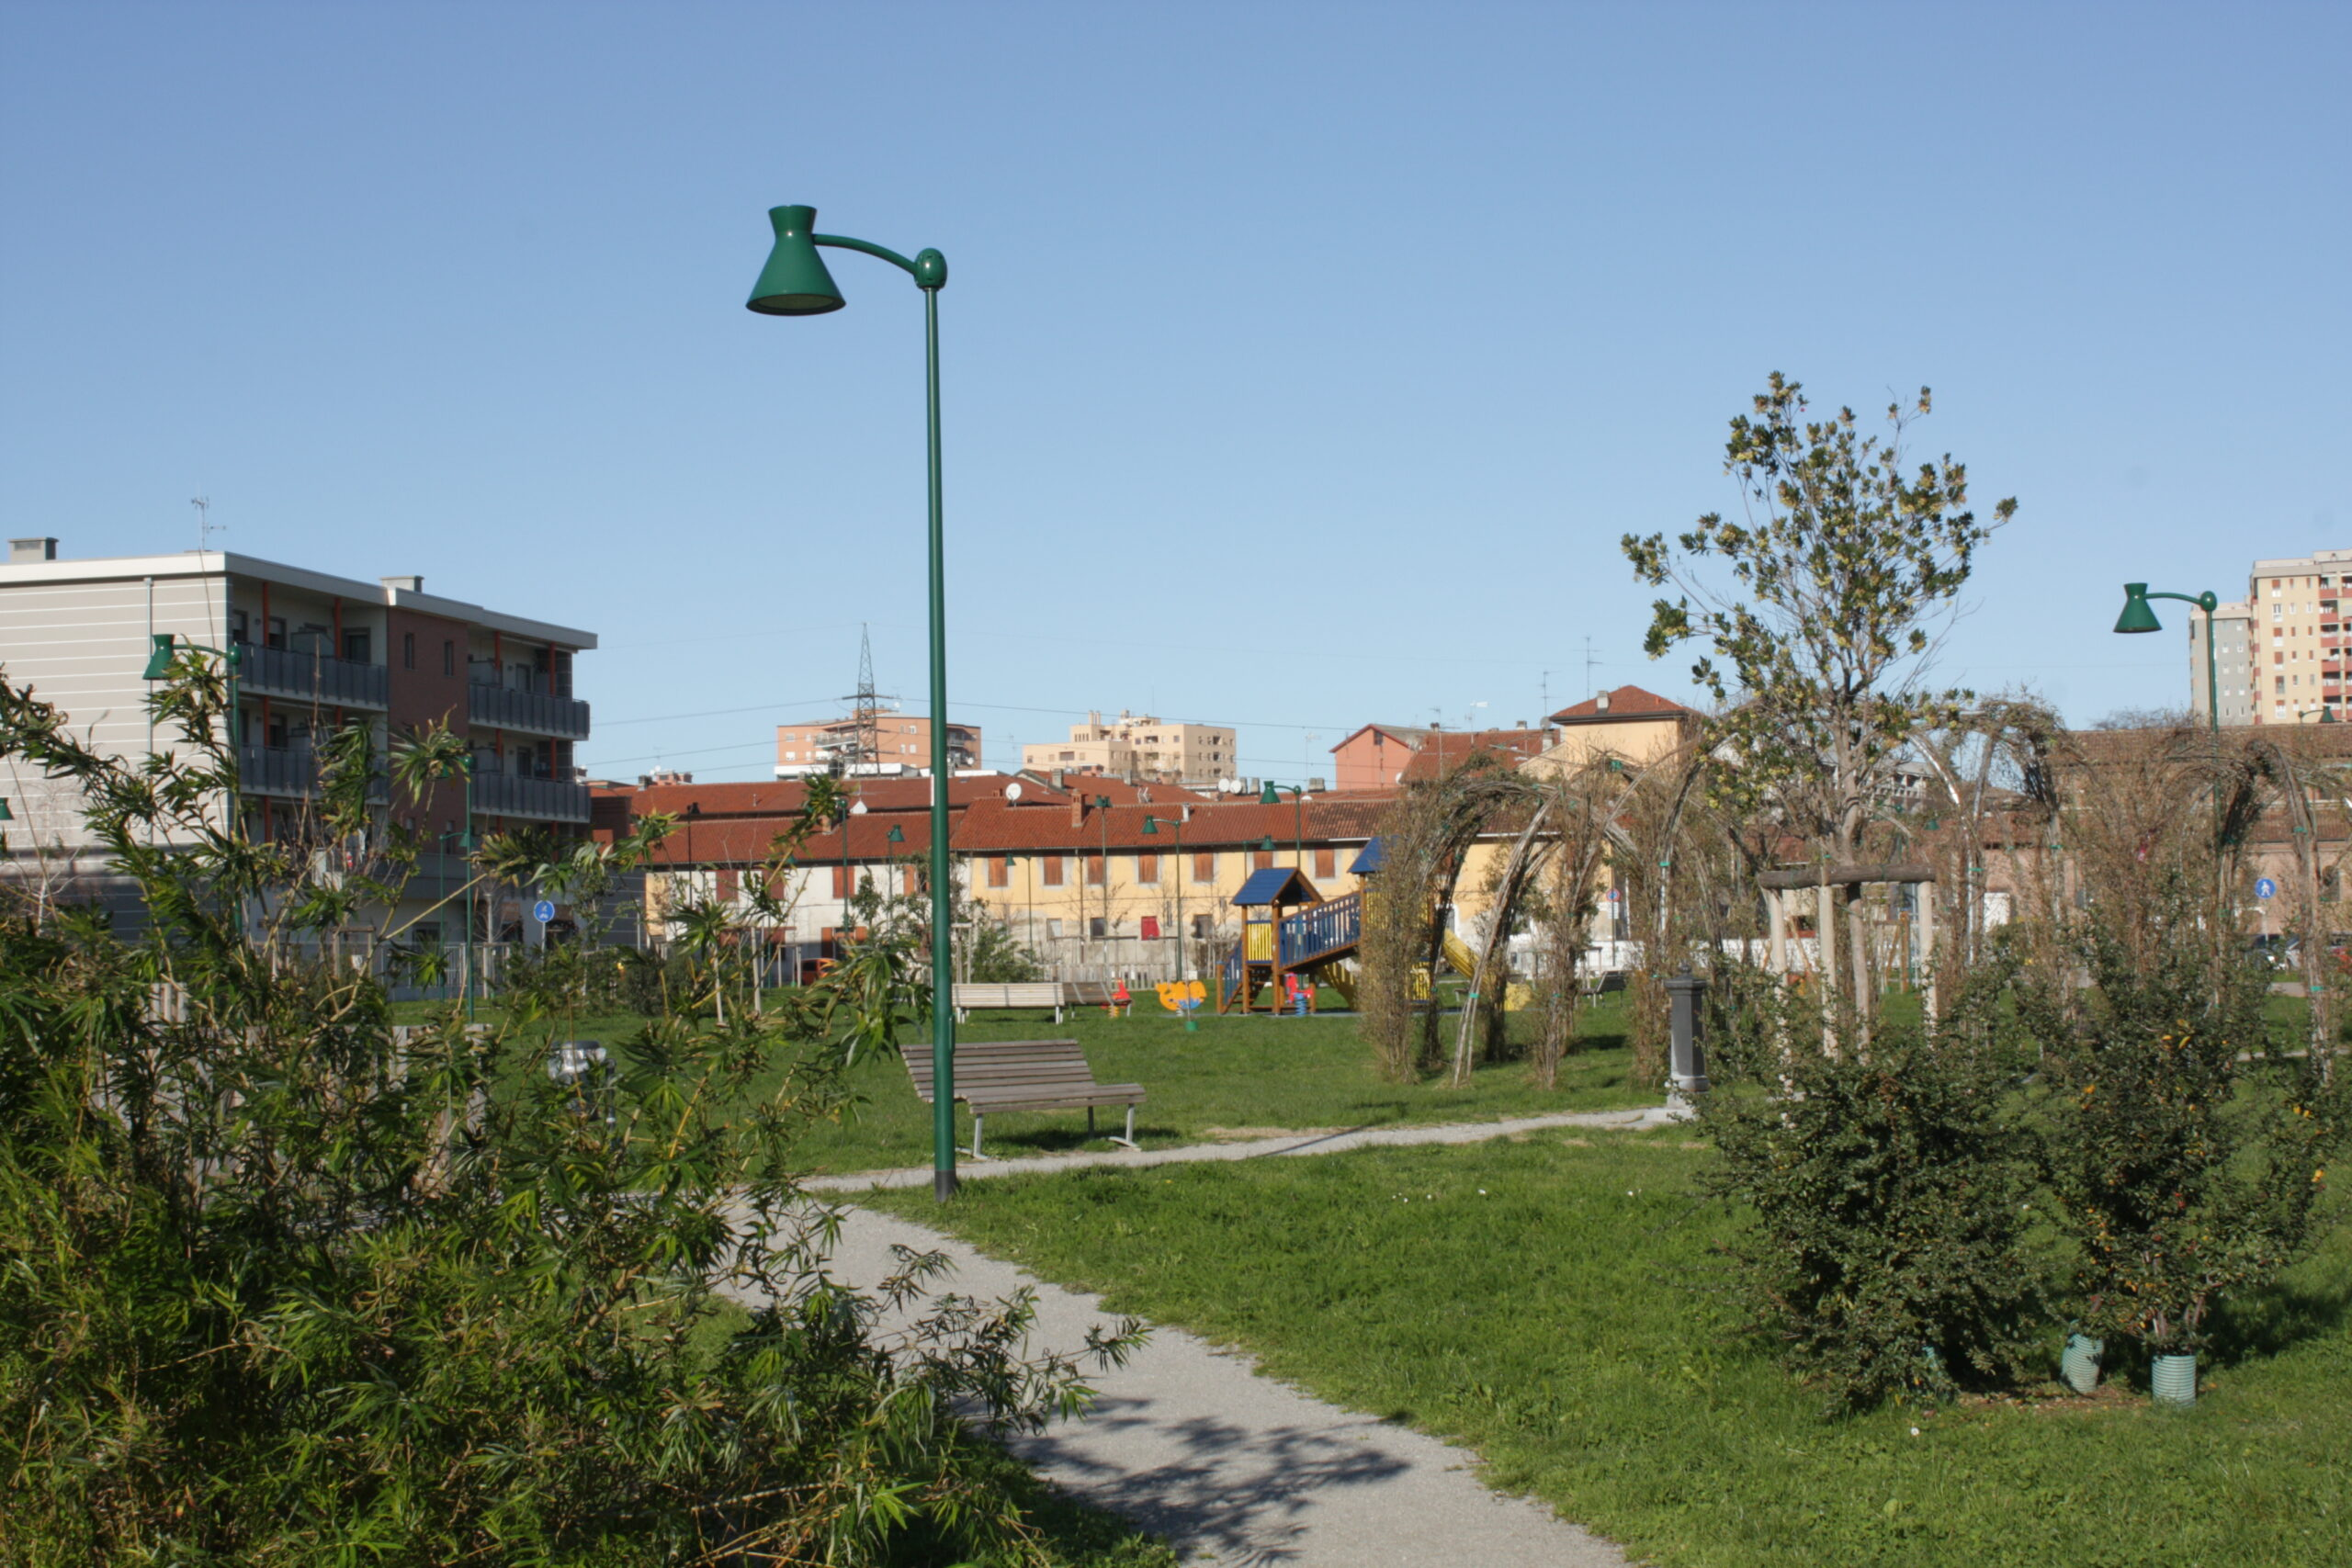 Da Regione Lombardia 1.2 milioni per piazza Petazzi e Parco Bergamella